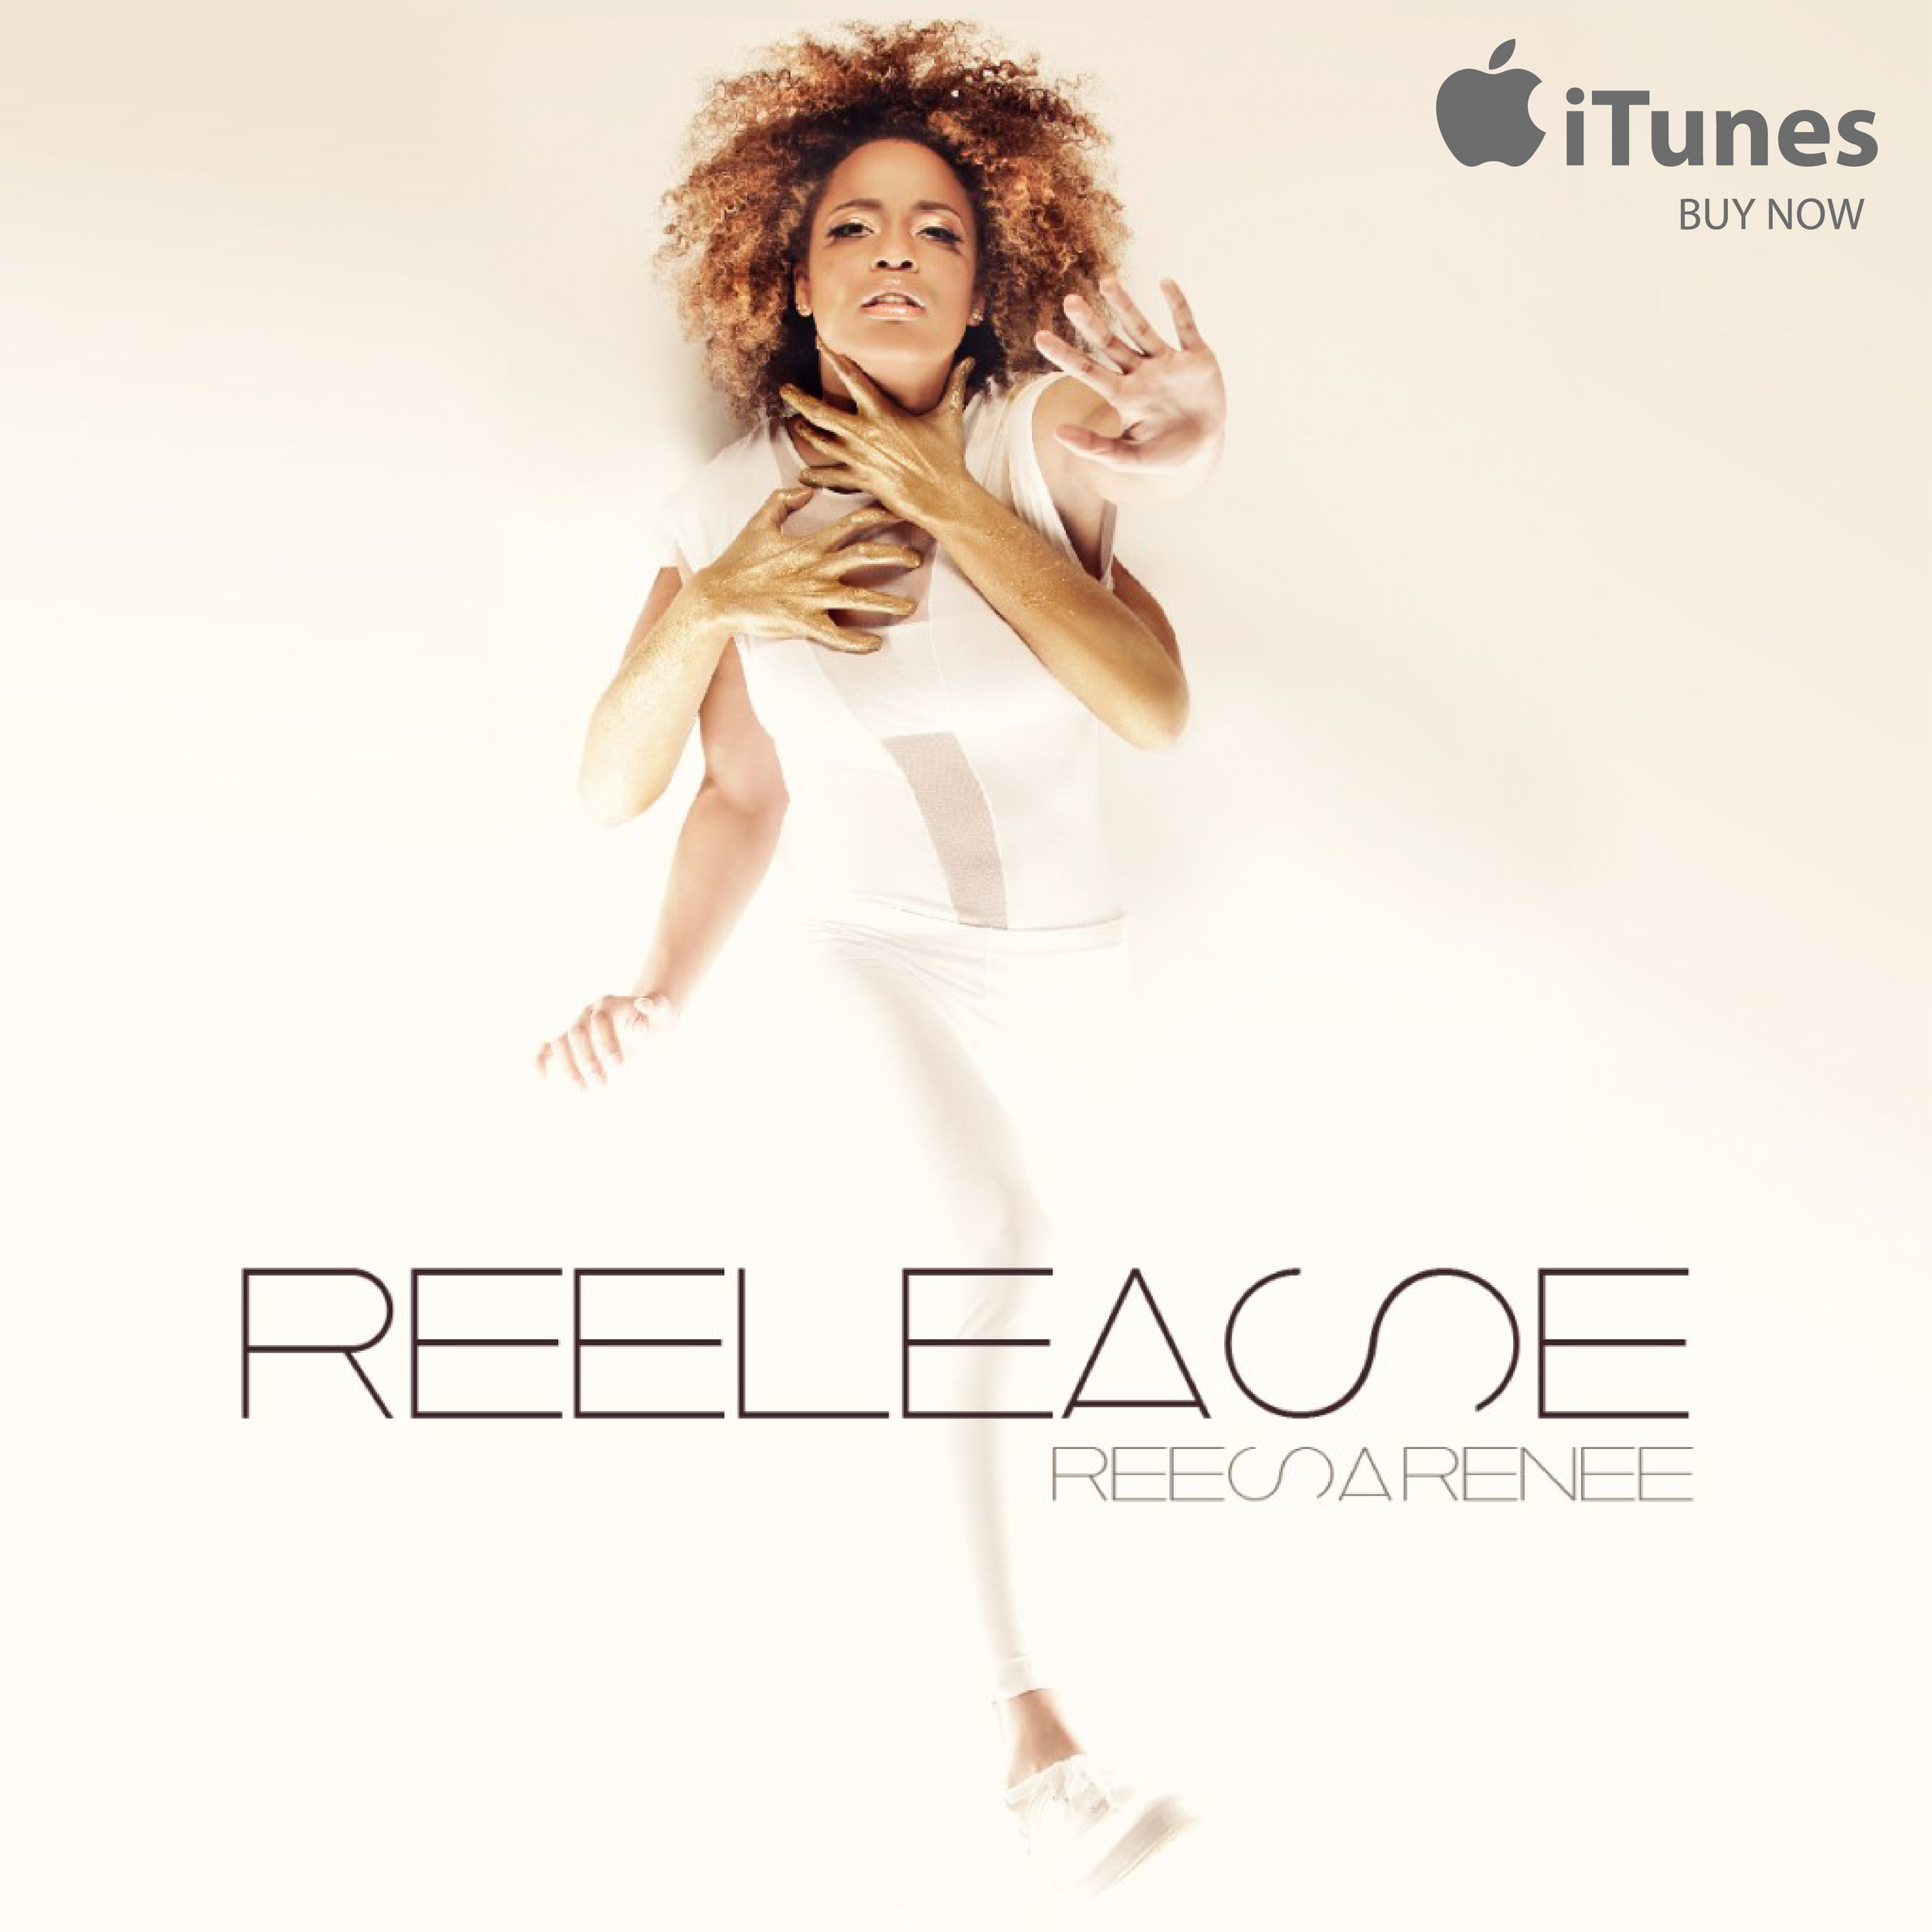 Reesa-Renee_20120712_Album_Cover_Low_Res_RGB_01_01_01-1024x1024-01.jpg